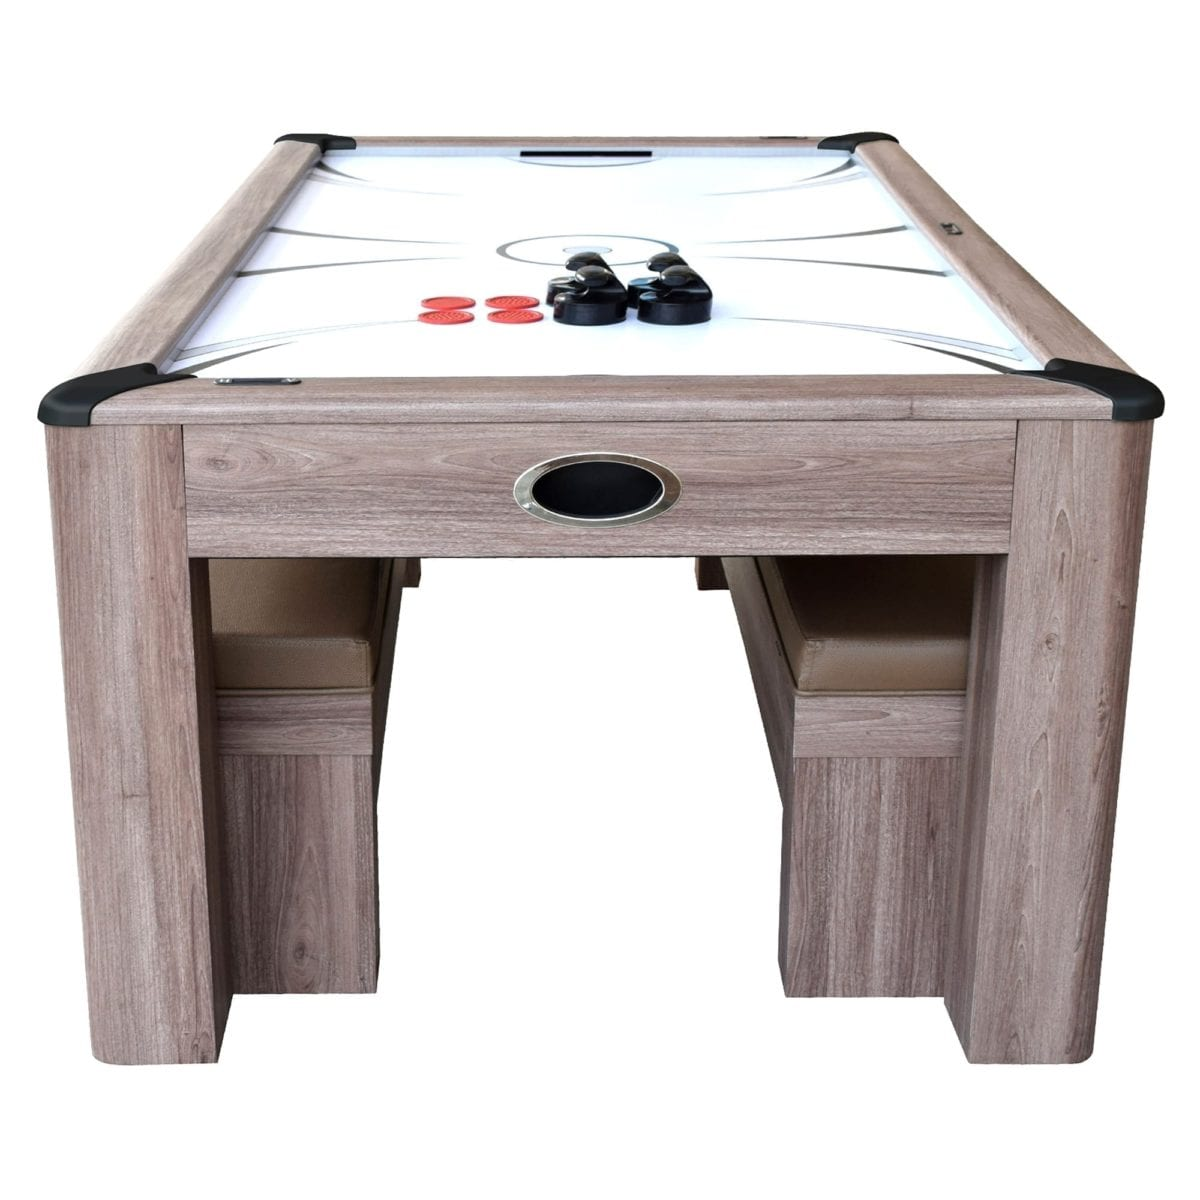 7 Foot Driftwood Air Hockey Table Tennis Combo Set W